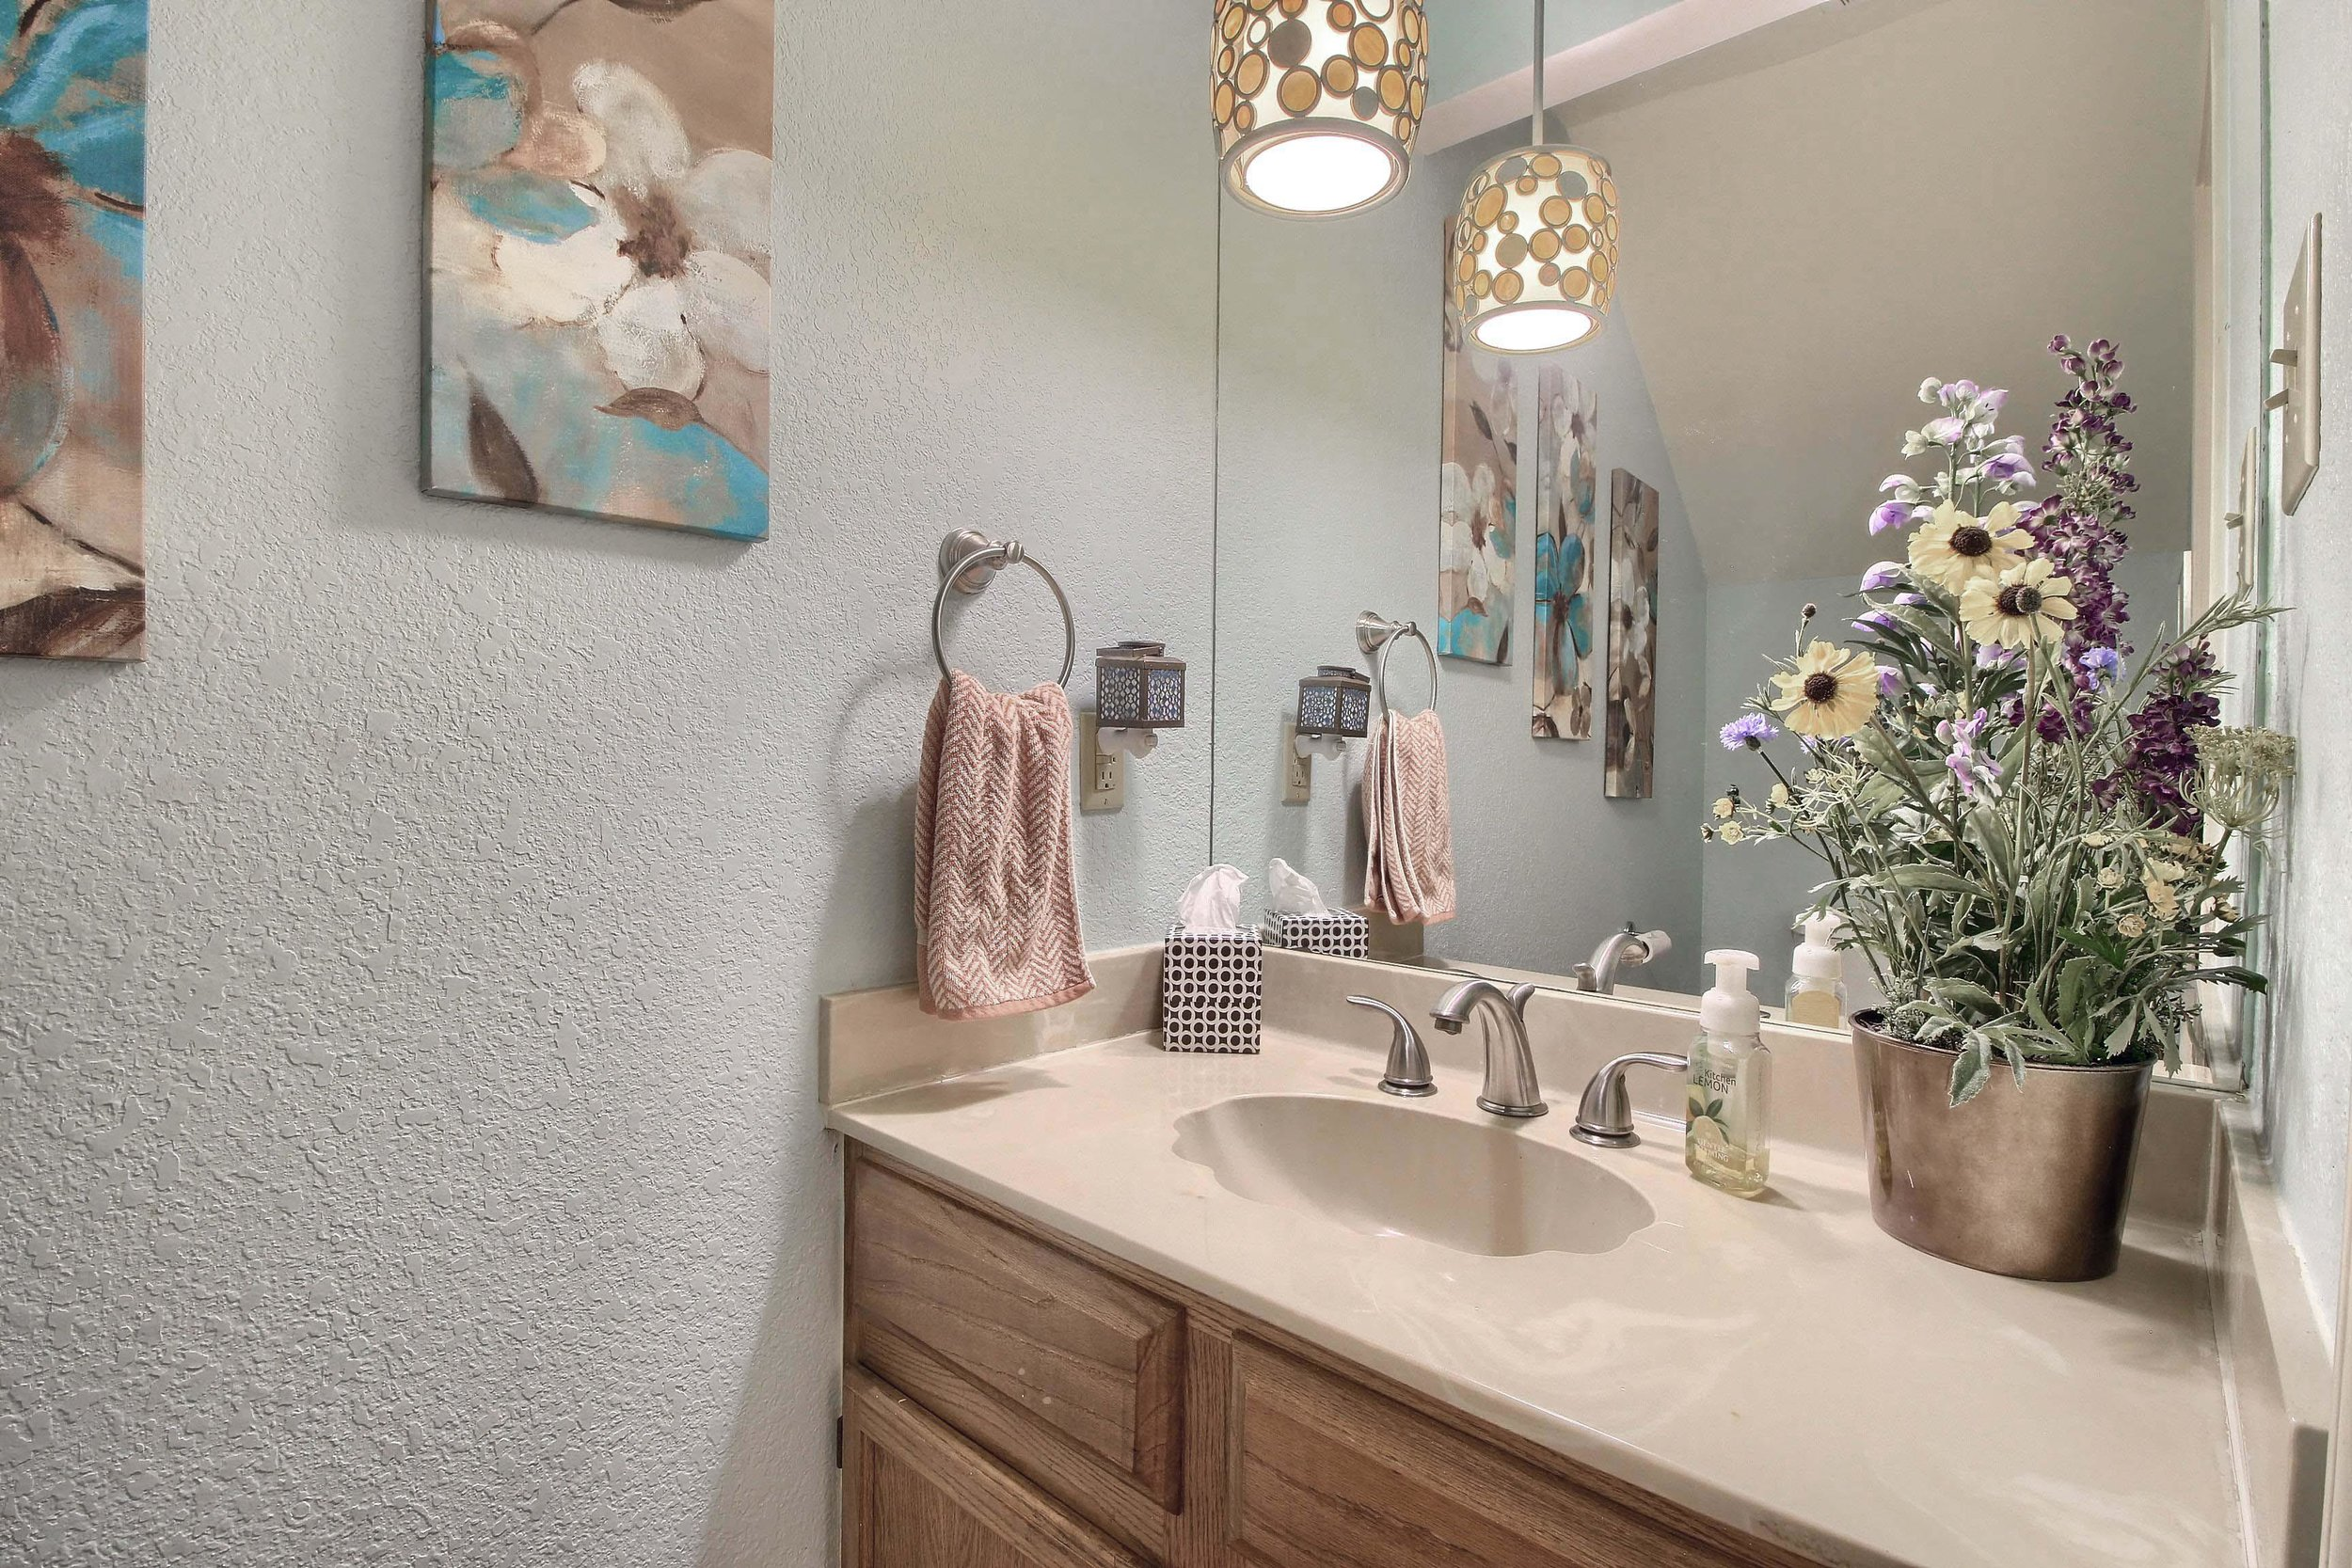 07_Bathroom_IMG_8246.JPG